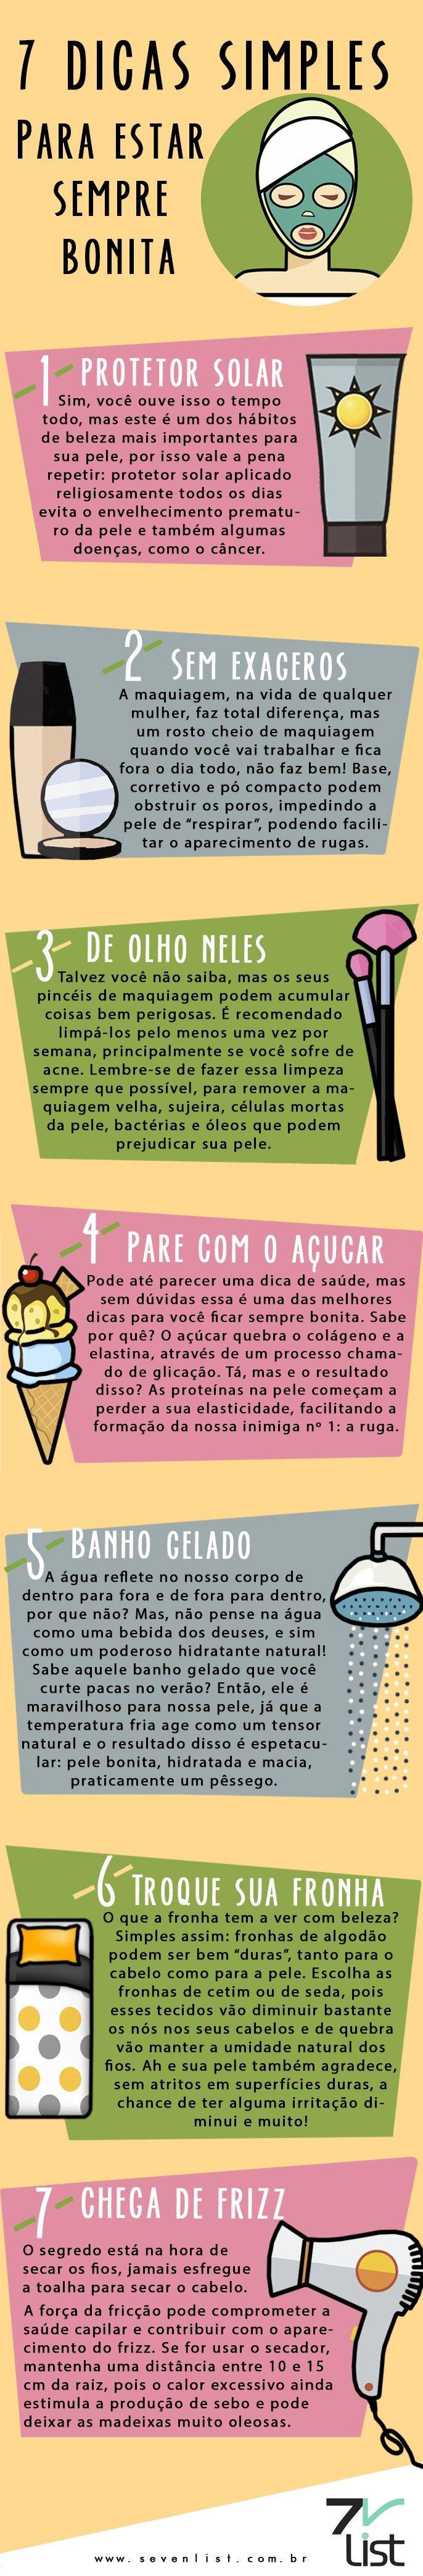 7 list_7 dicas simples para estar sempre bonita